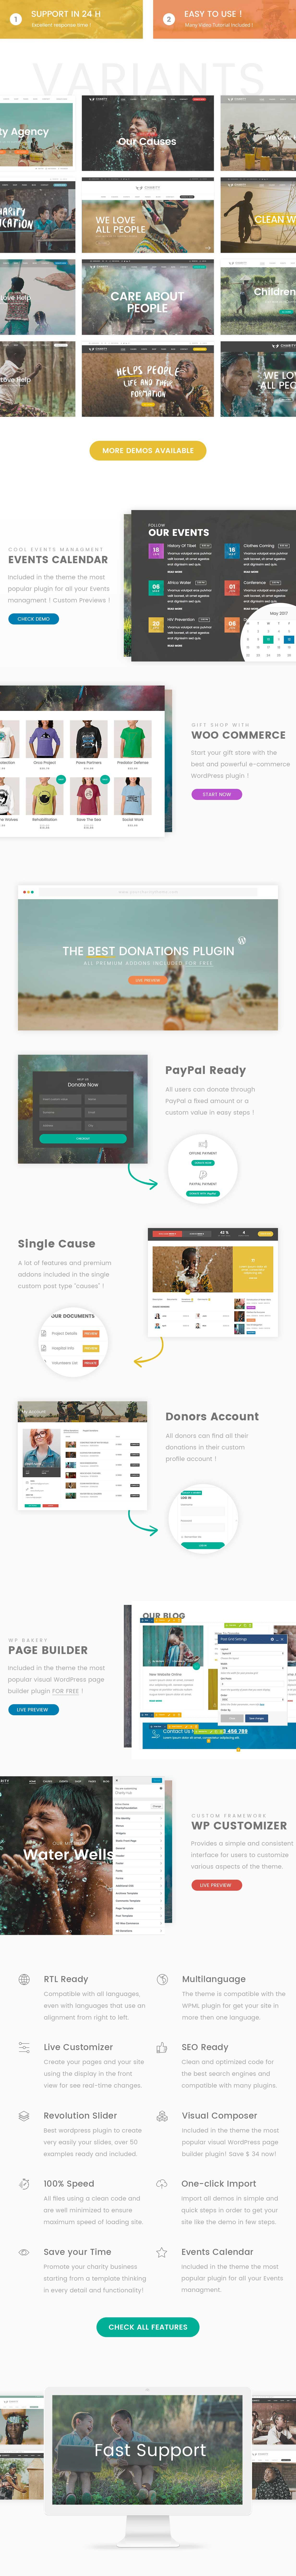 charity description 3 - Charity Foundation